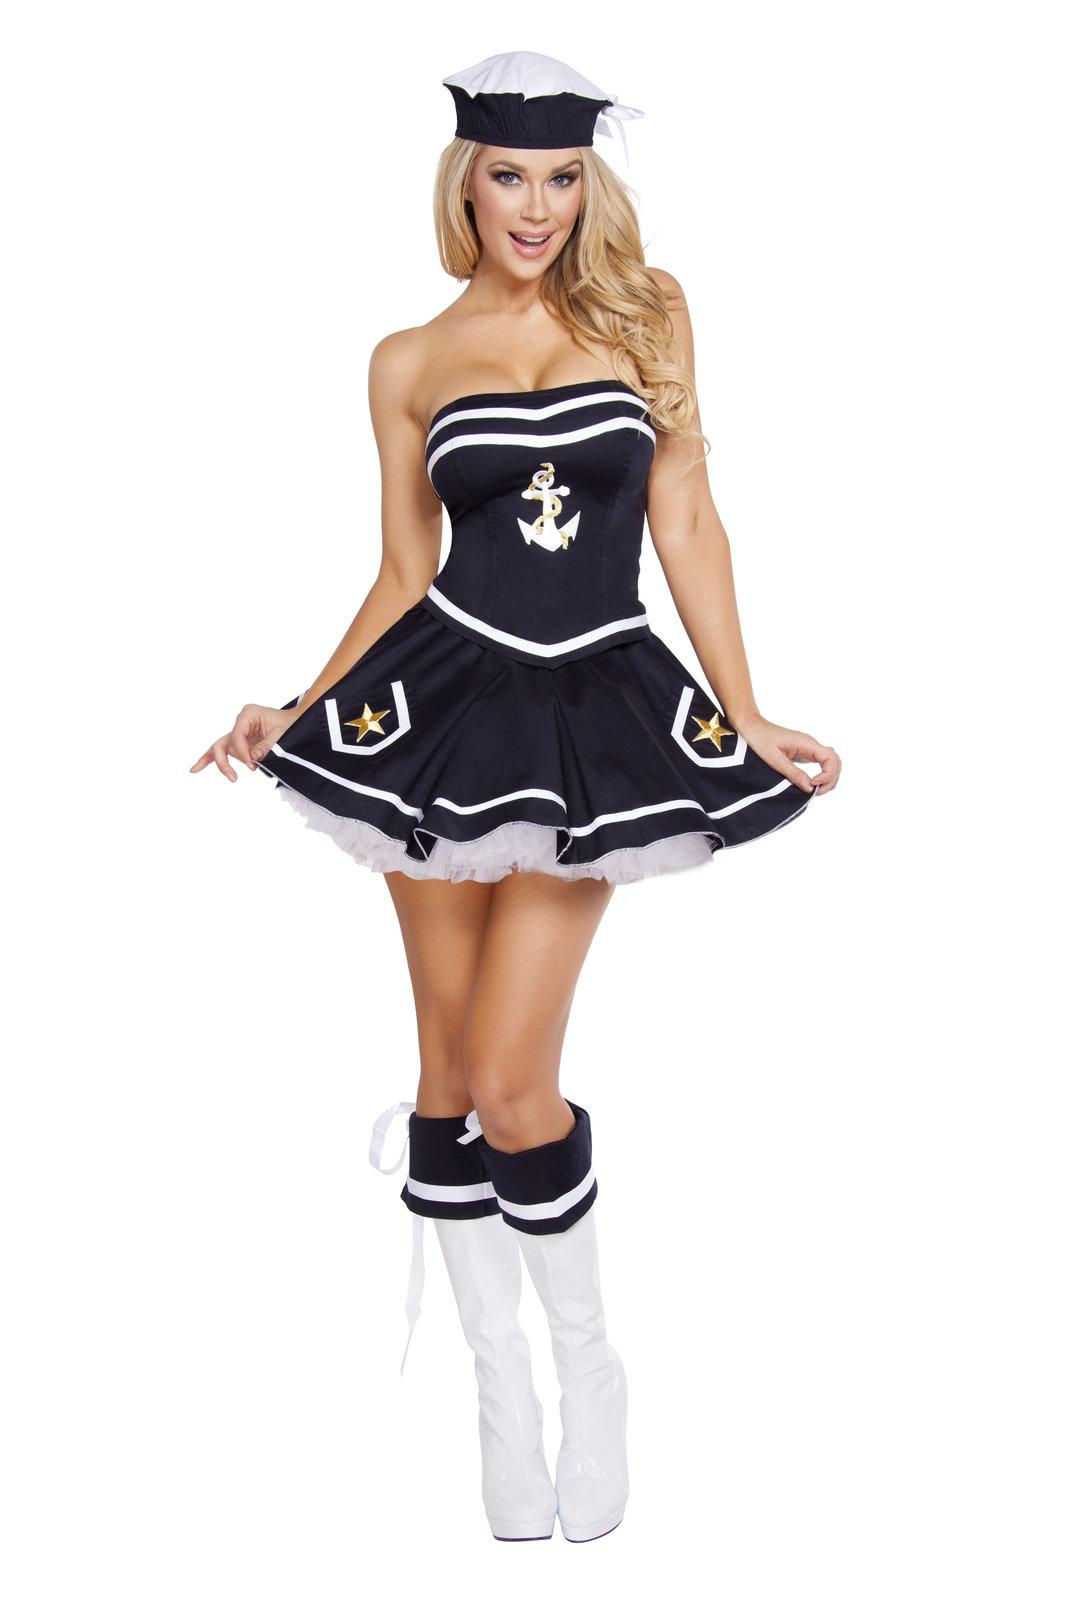 Roma Naughty Navy Yard Vixen Sailor Halloween Costume W/WO EXTRAS XS-M/L 4580  sc 1 st  Bonanza & Roma Naughty Navy Yard Vixen Sailor and 50 similar items